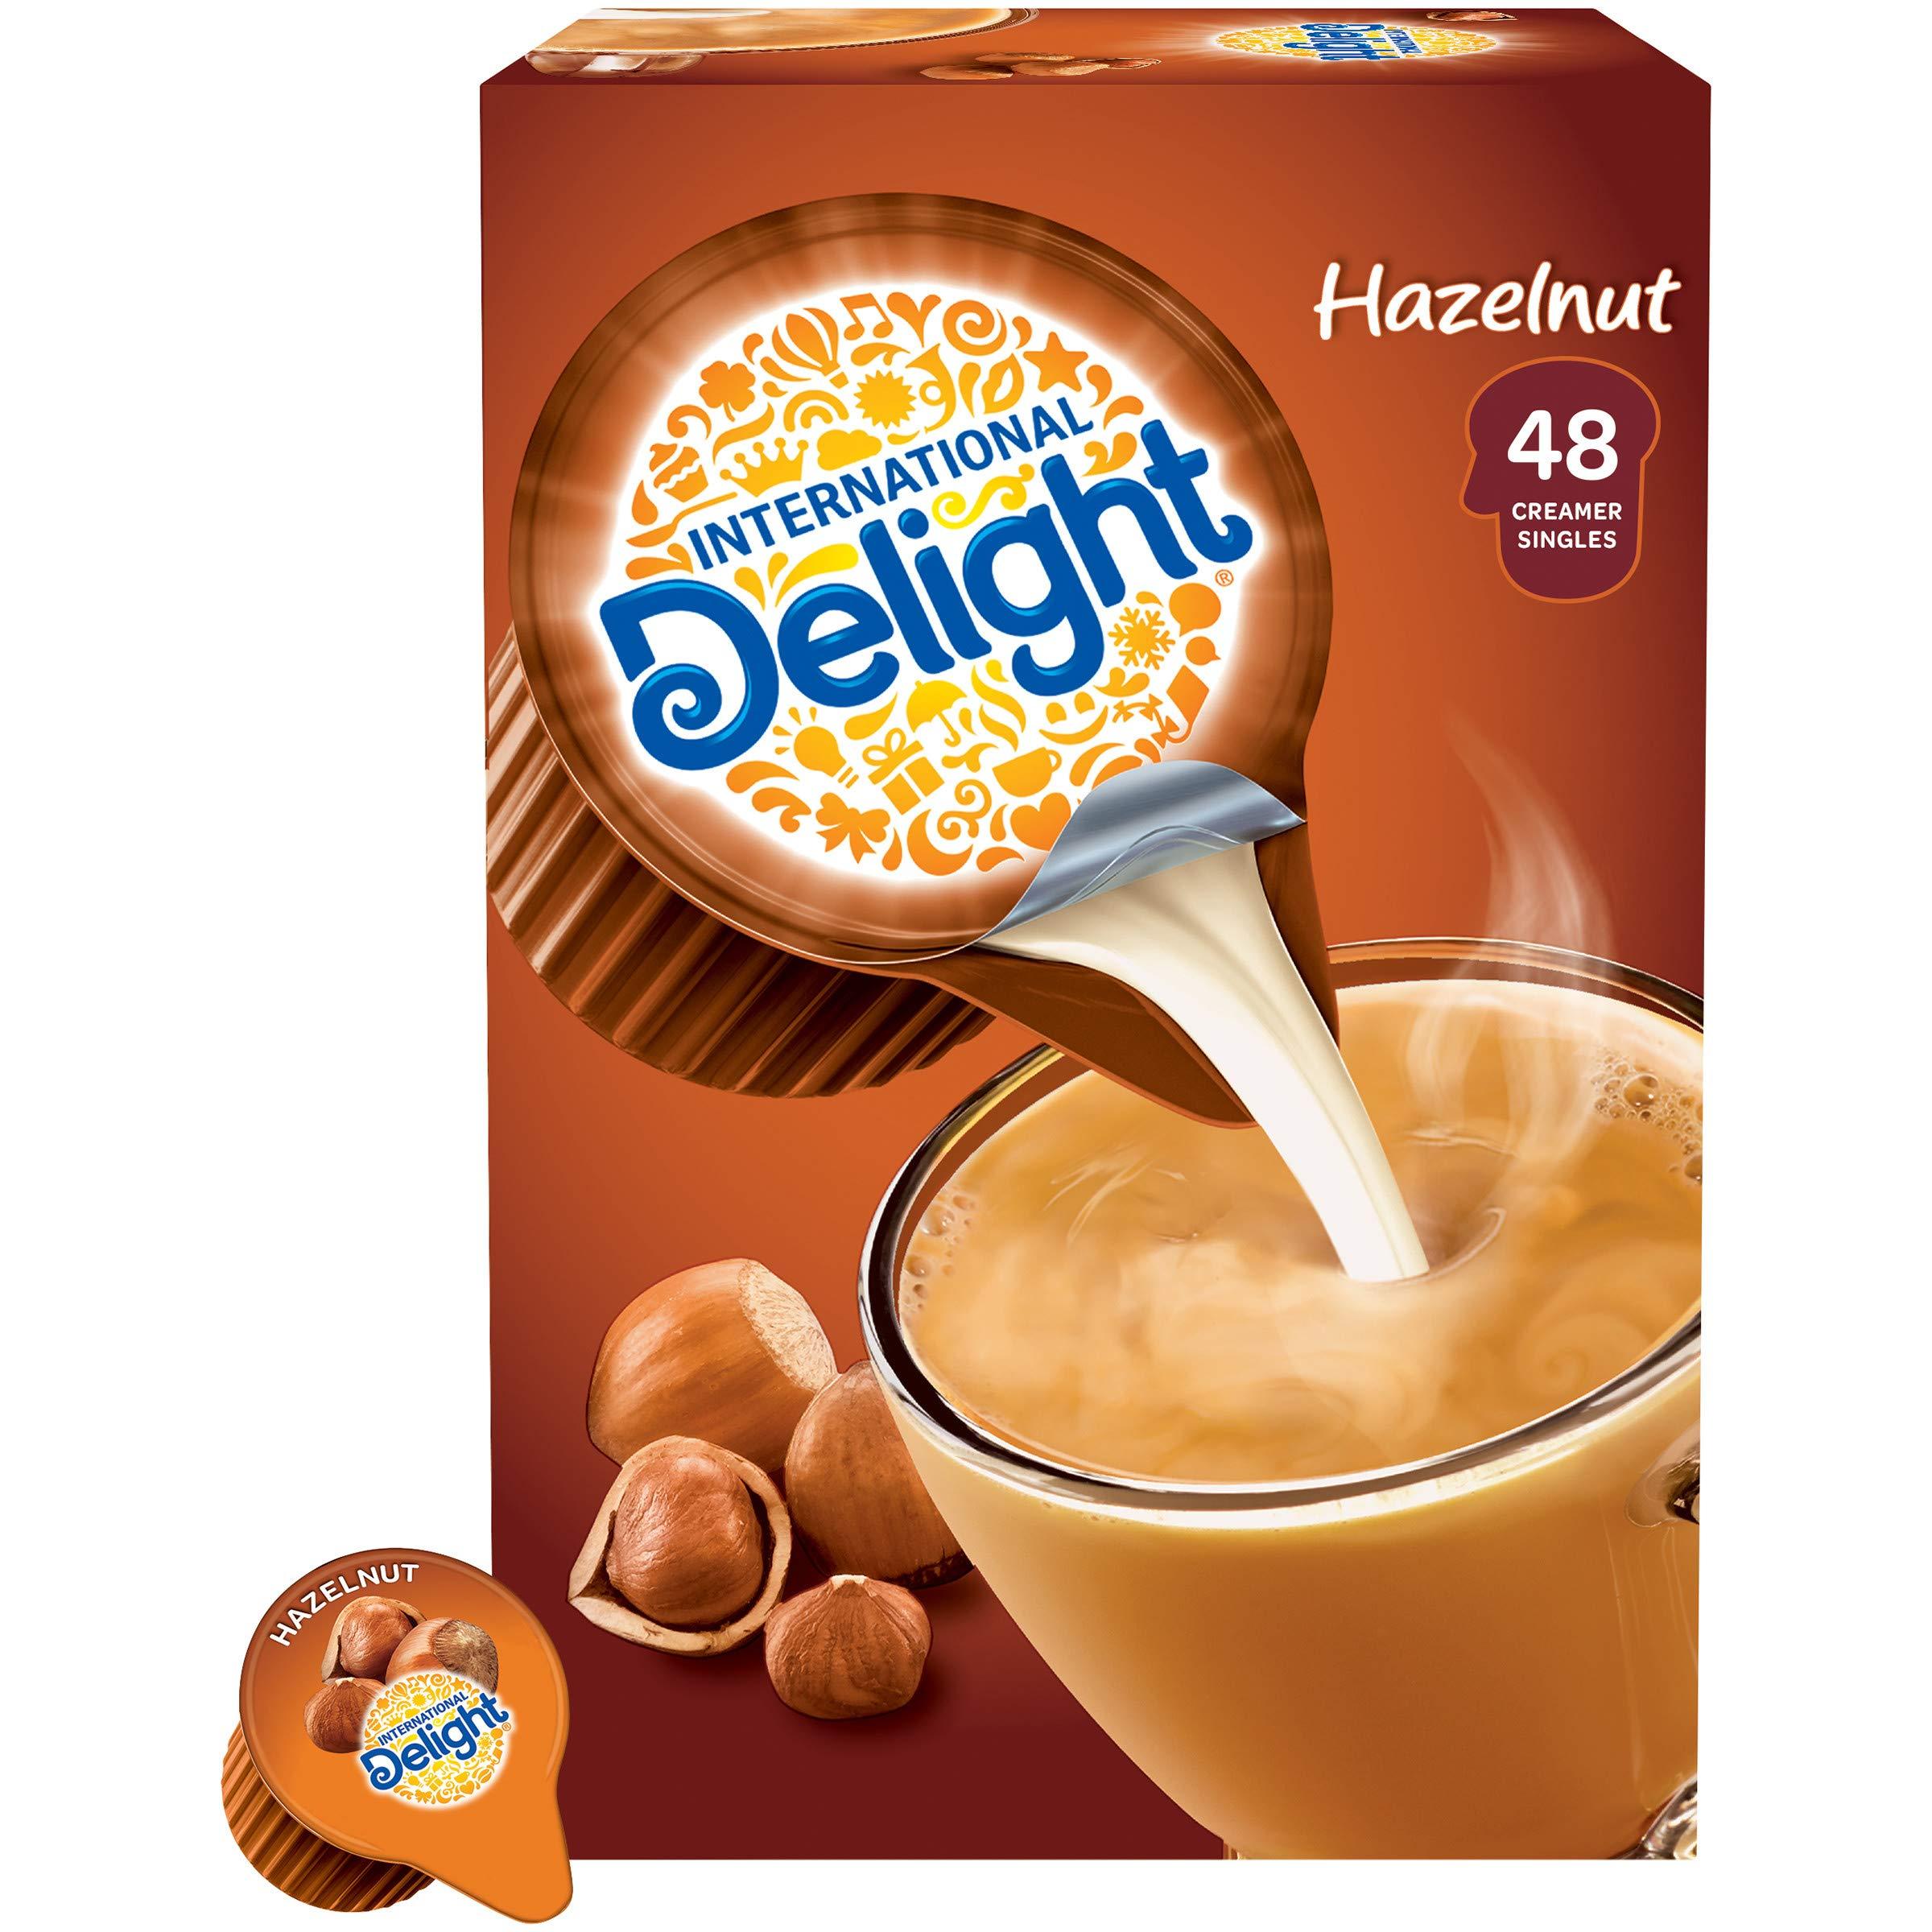 International Delight Coffee Creamer Singles, Hazelnut, 48 Count (Pack of 4)